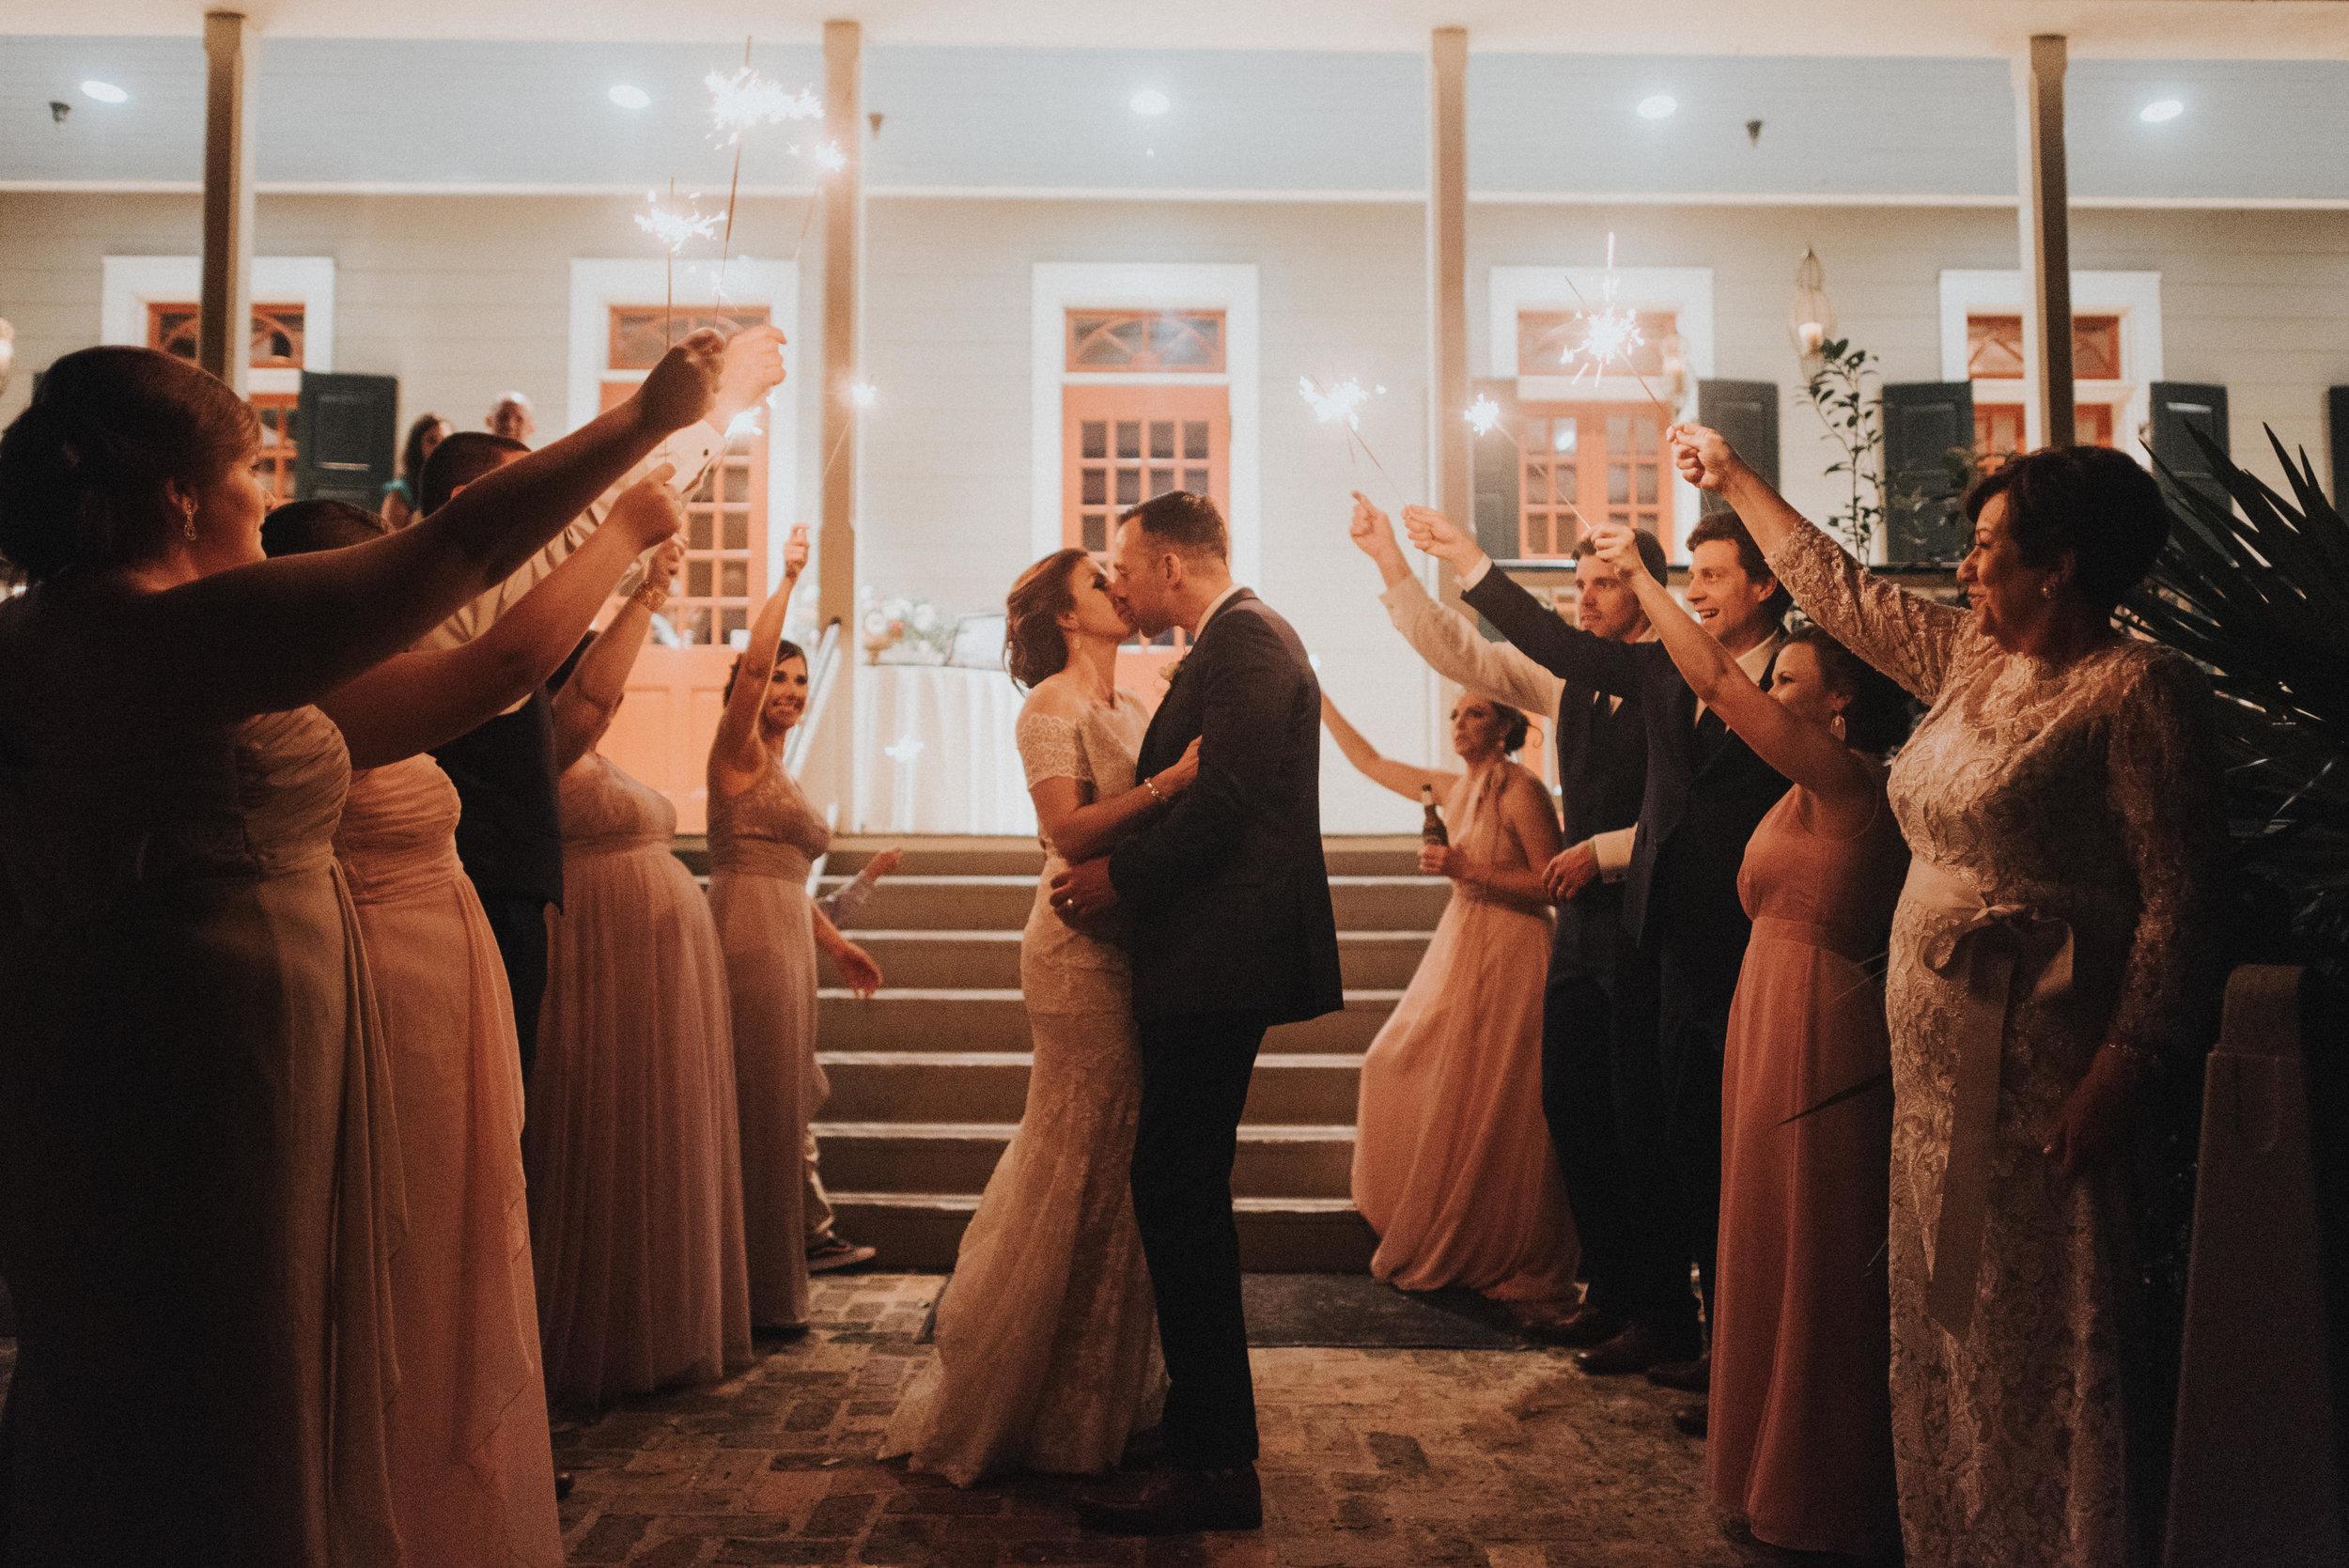 Southern Fete, Southern Wedding, Aaron Lane Entertainment, T'Monde, Reception party, Sparkler exit